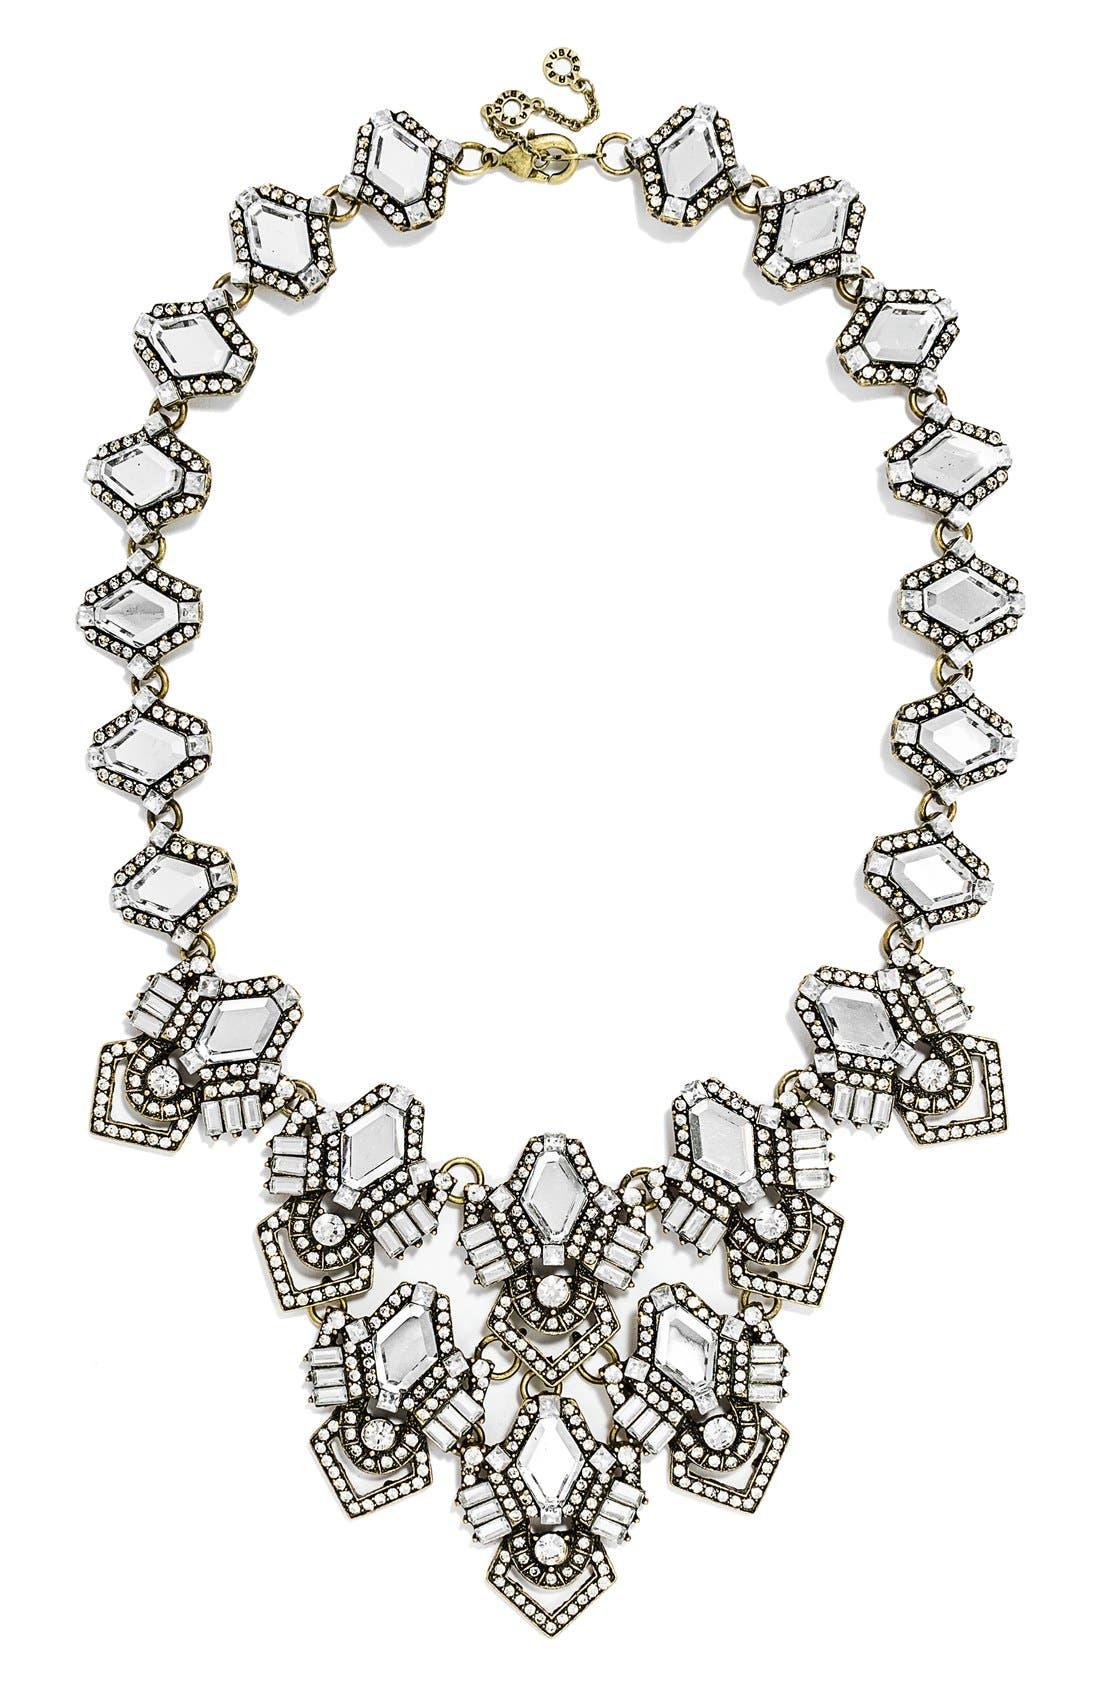 Alternate Image 1 Selected - BaubleBar 'Deco Diamond' Bib Necklace